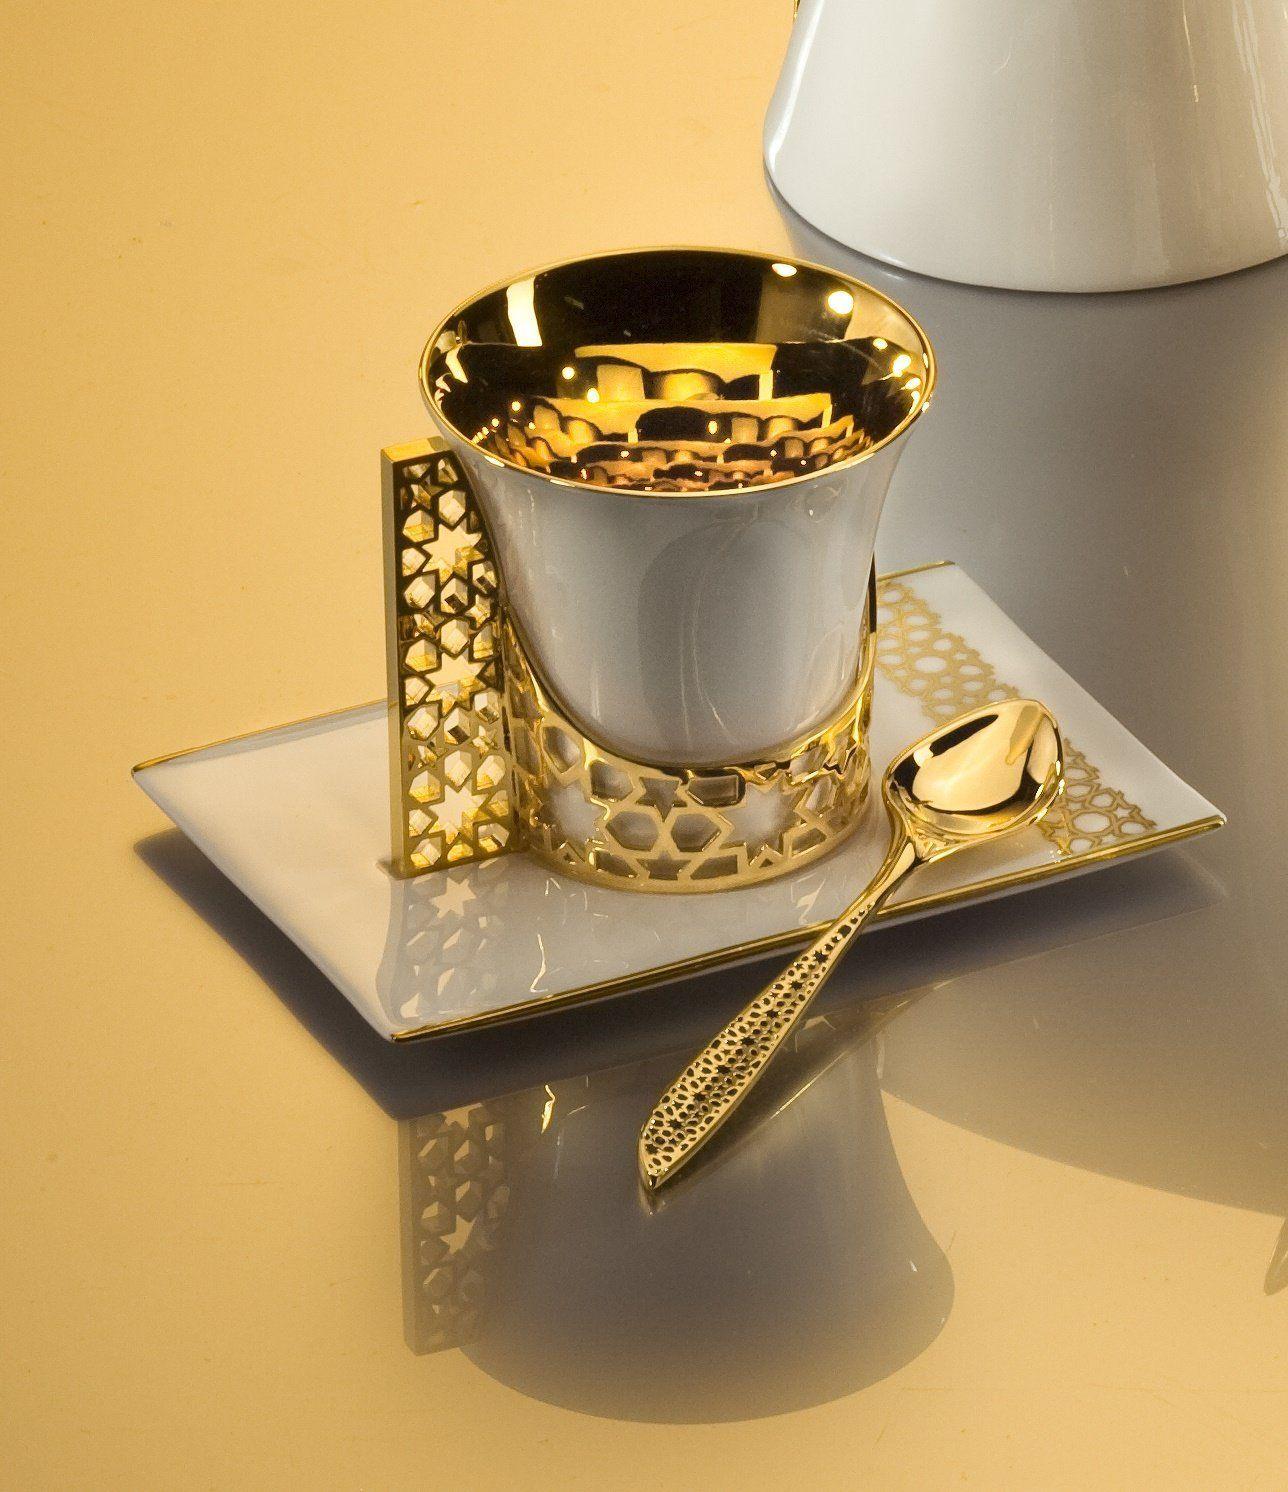 Amazon.com: 18K Gold Plated Arabesque Fine Bone China Porcelain ...